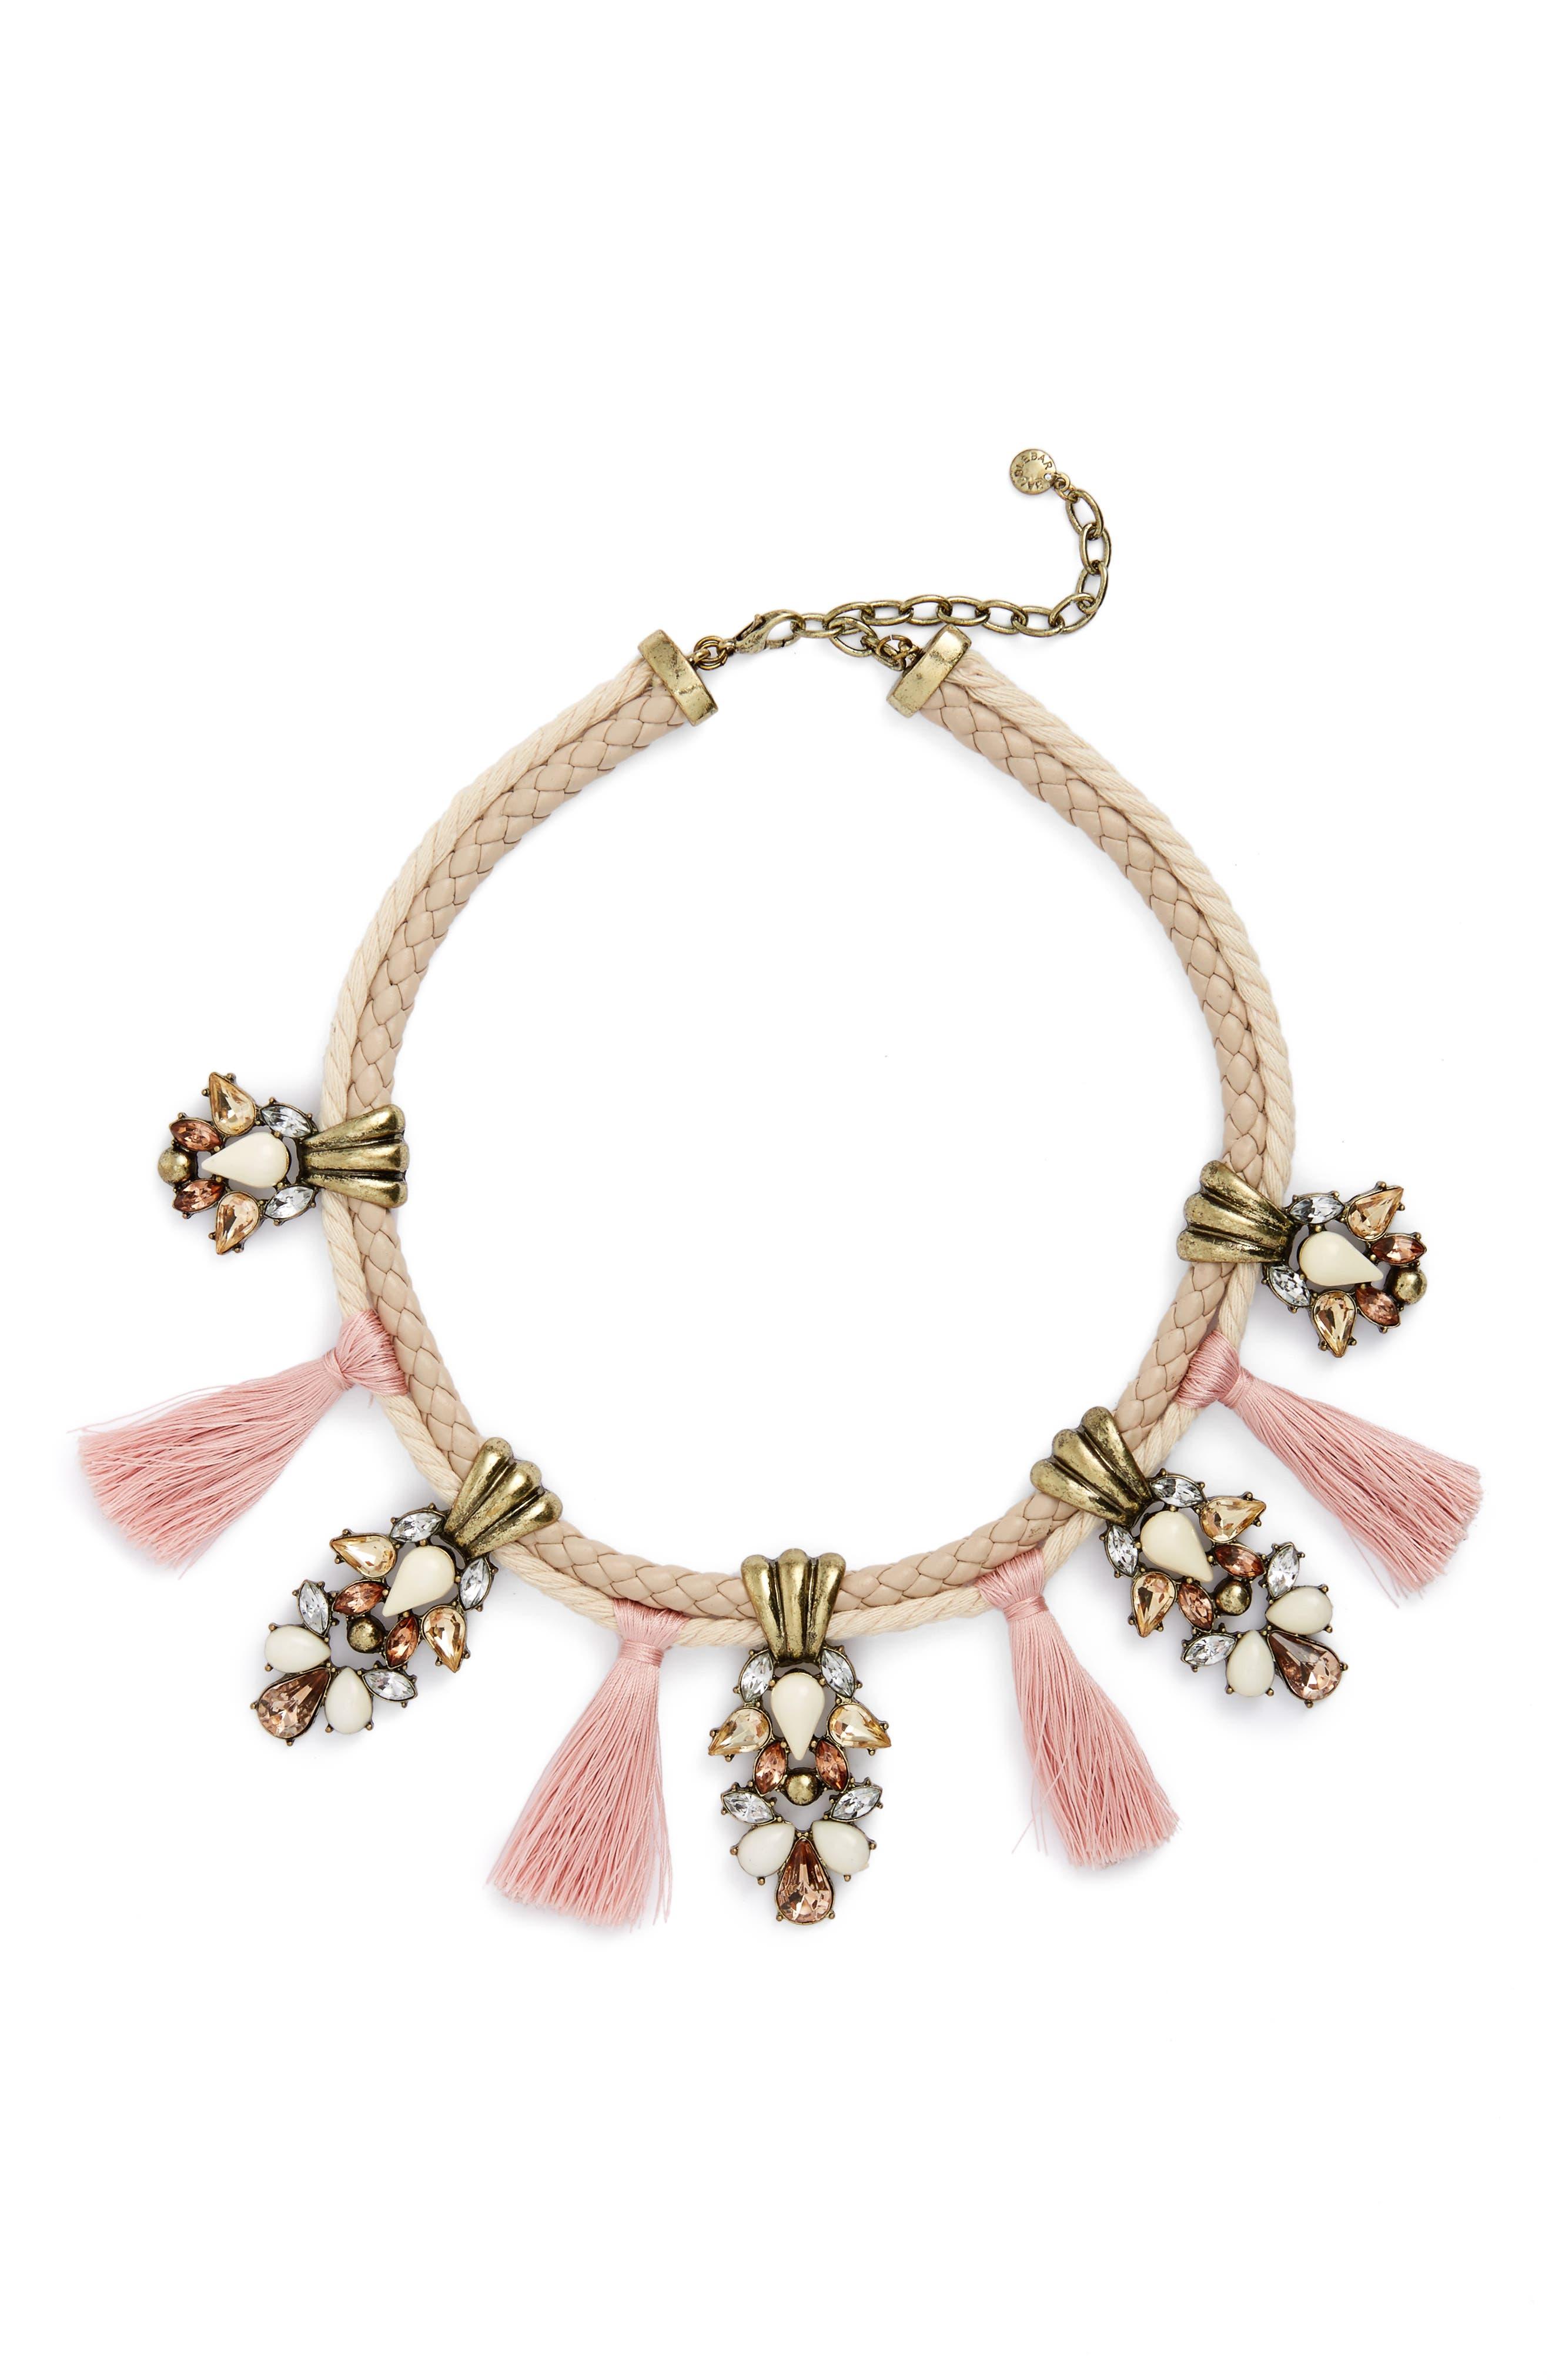 Repunzel Collar Necklace,                             Main thumbnail 1, color,                             Pink